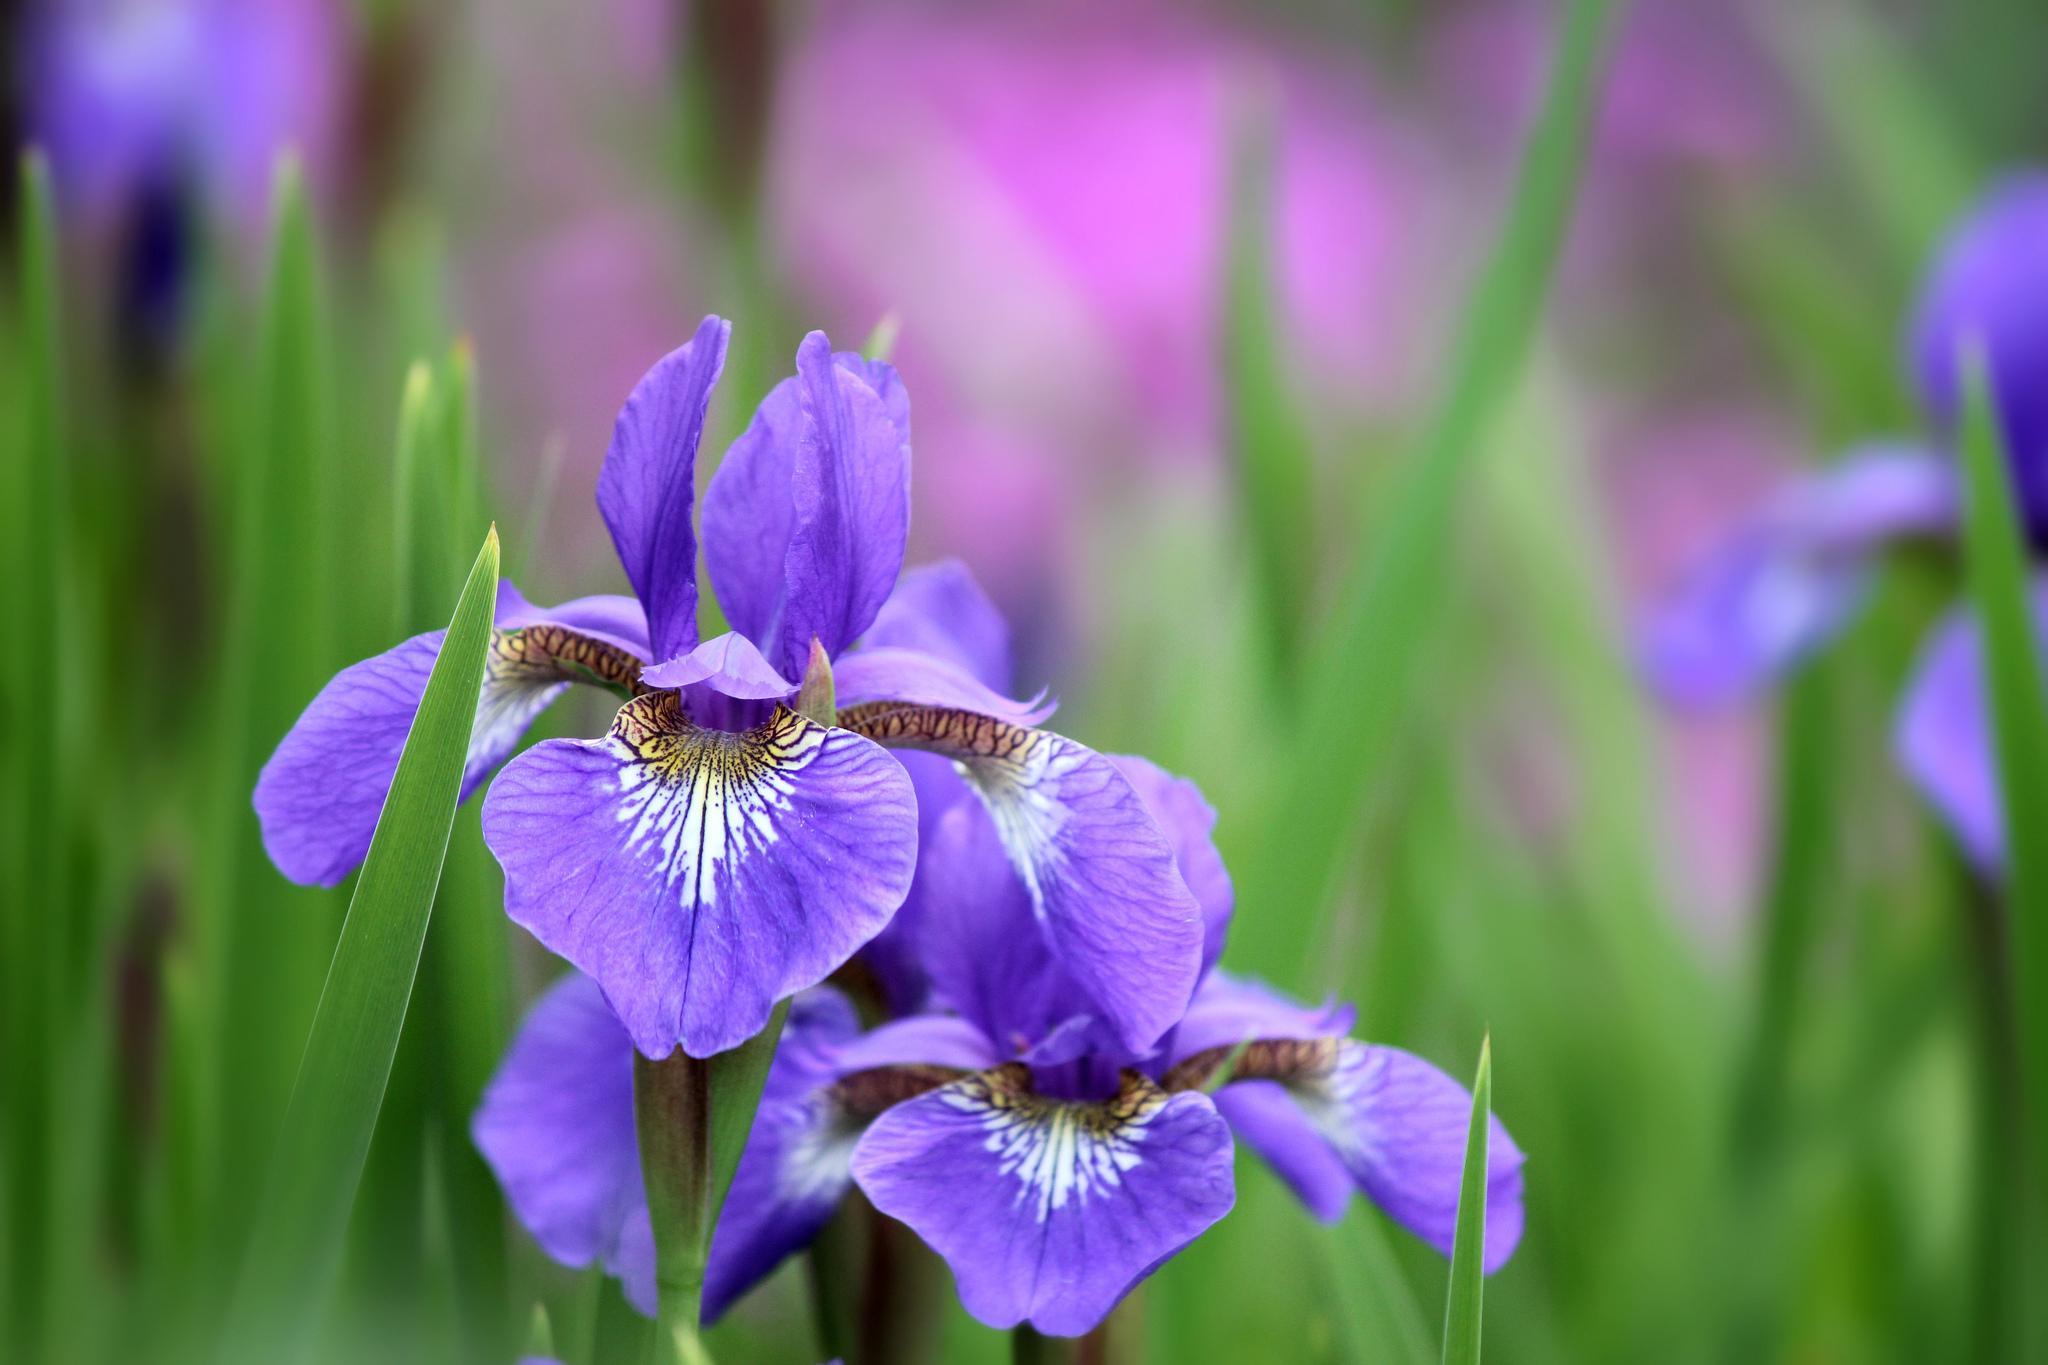 Iris wallpapers HD quality